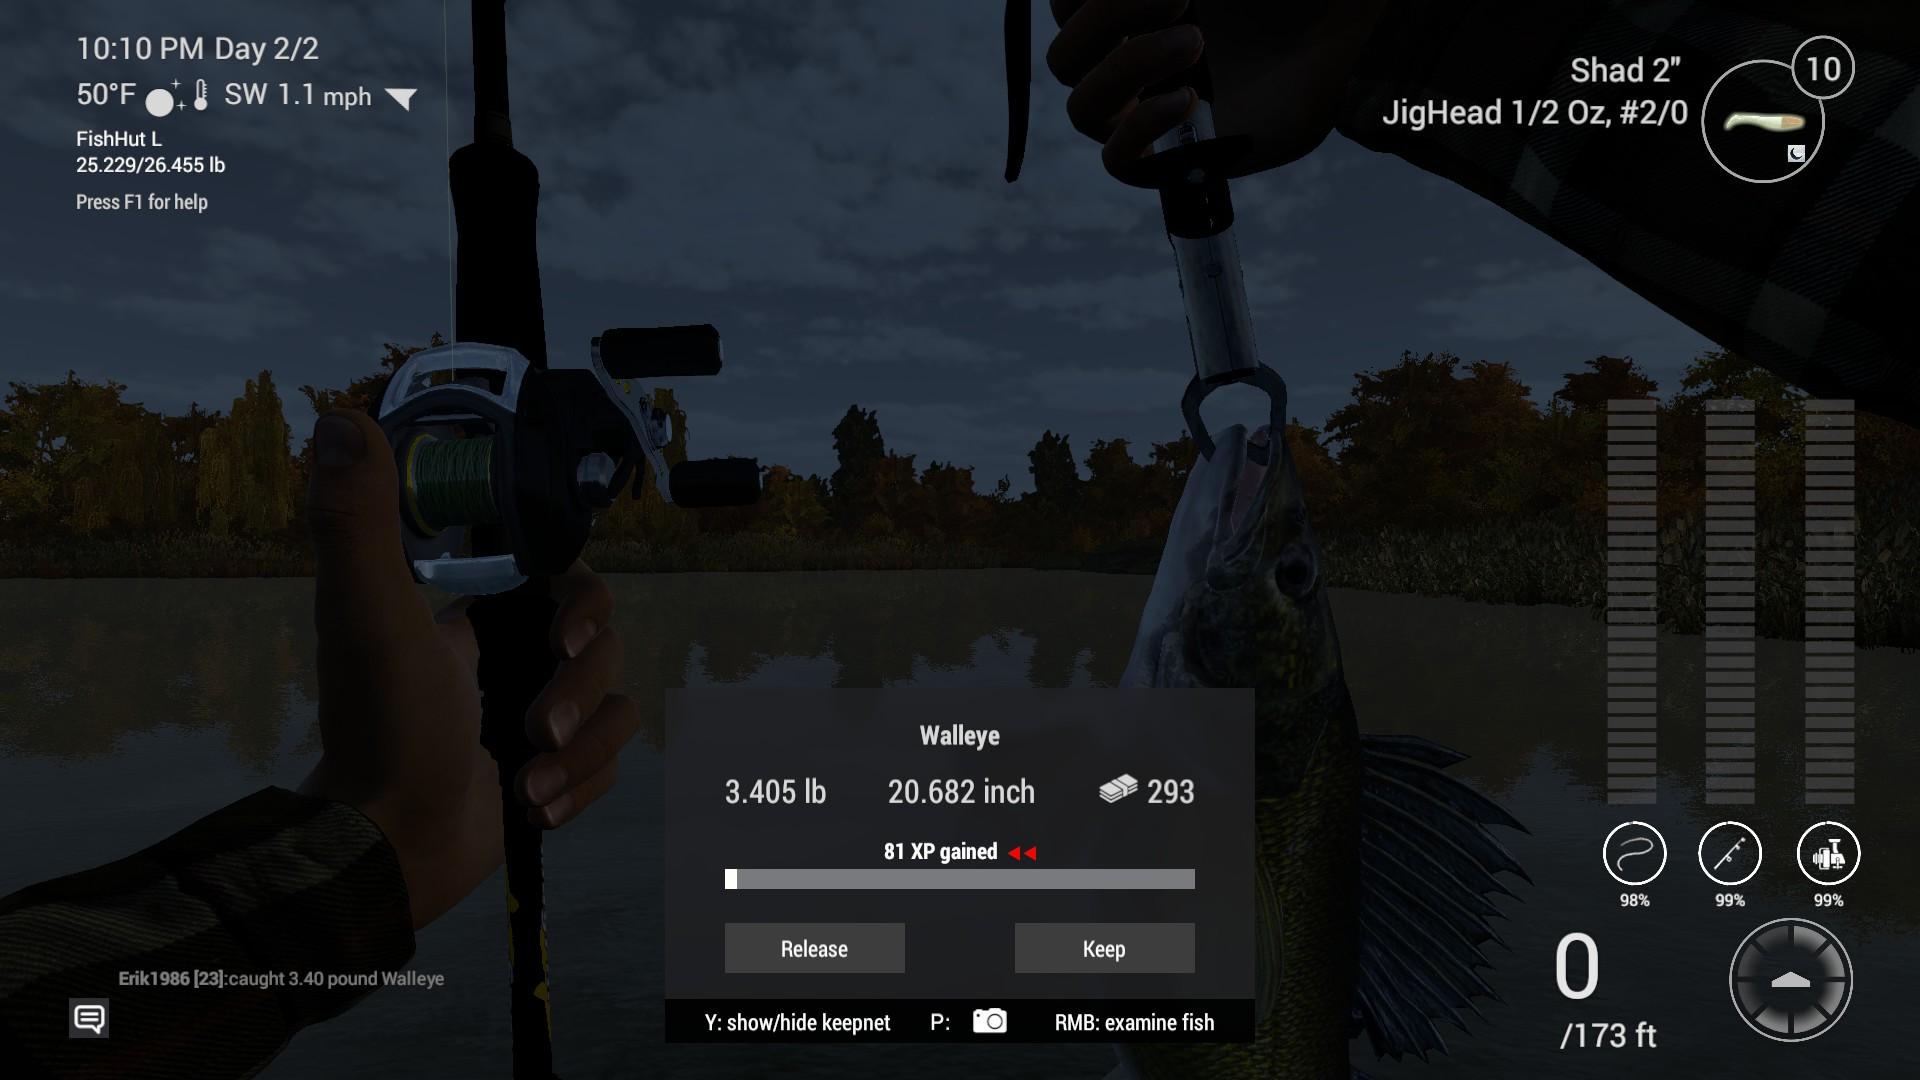 Steam Community :: Guide :: New York - Emerald Lake: Walleye